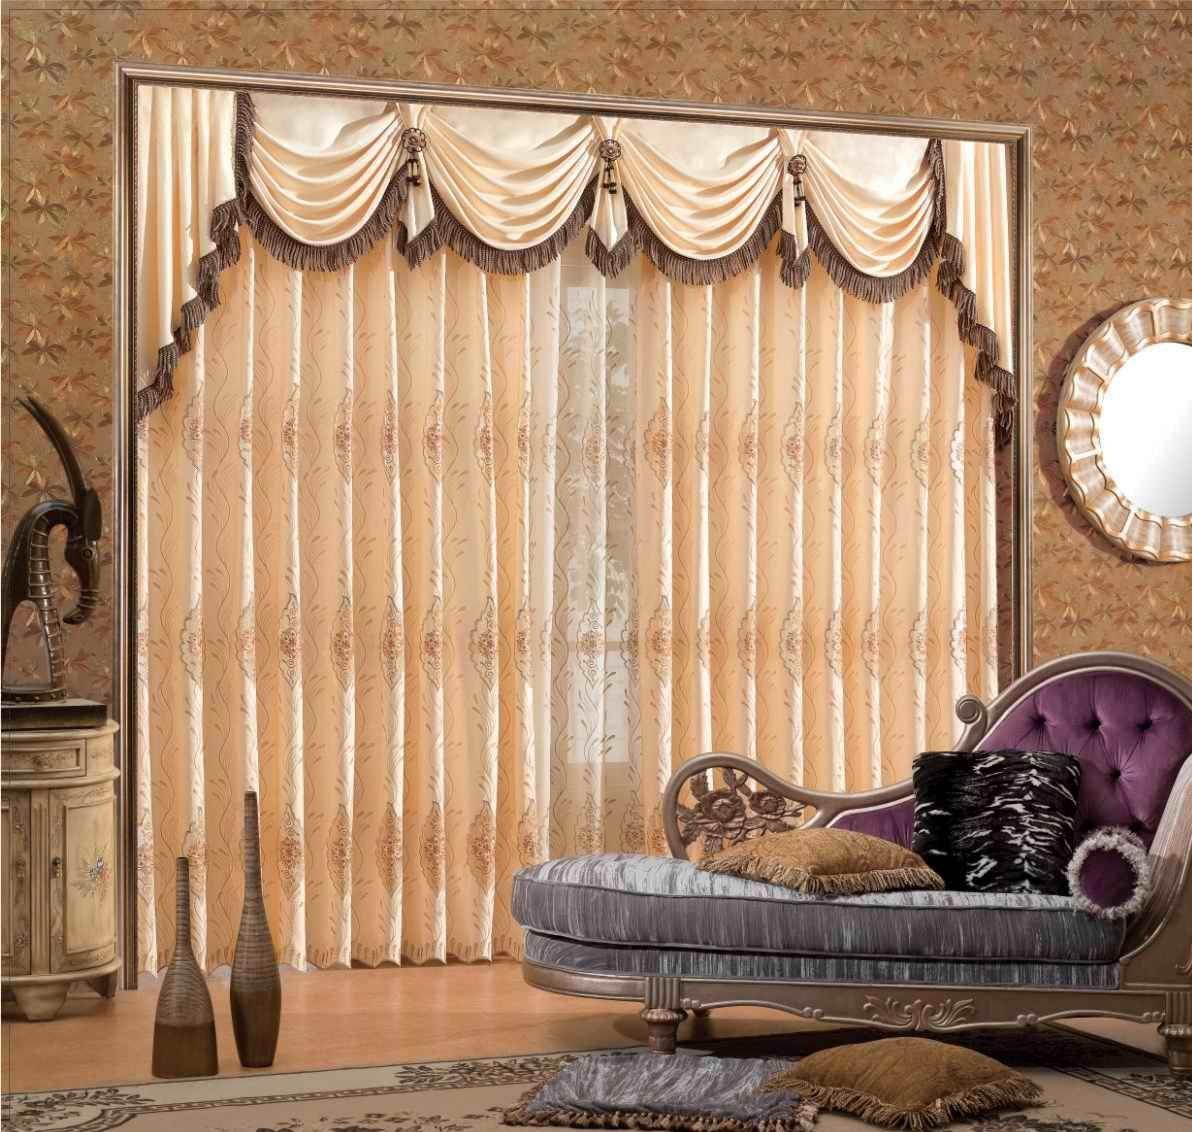 Arab Style Curtains  Buy Arab Style Curtains,european Style Curtains,american  Style Curtain